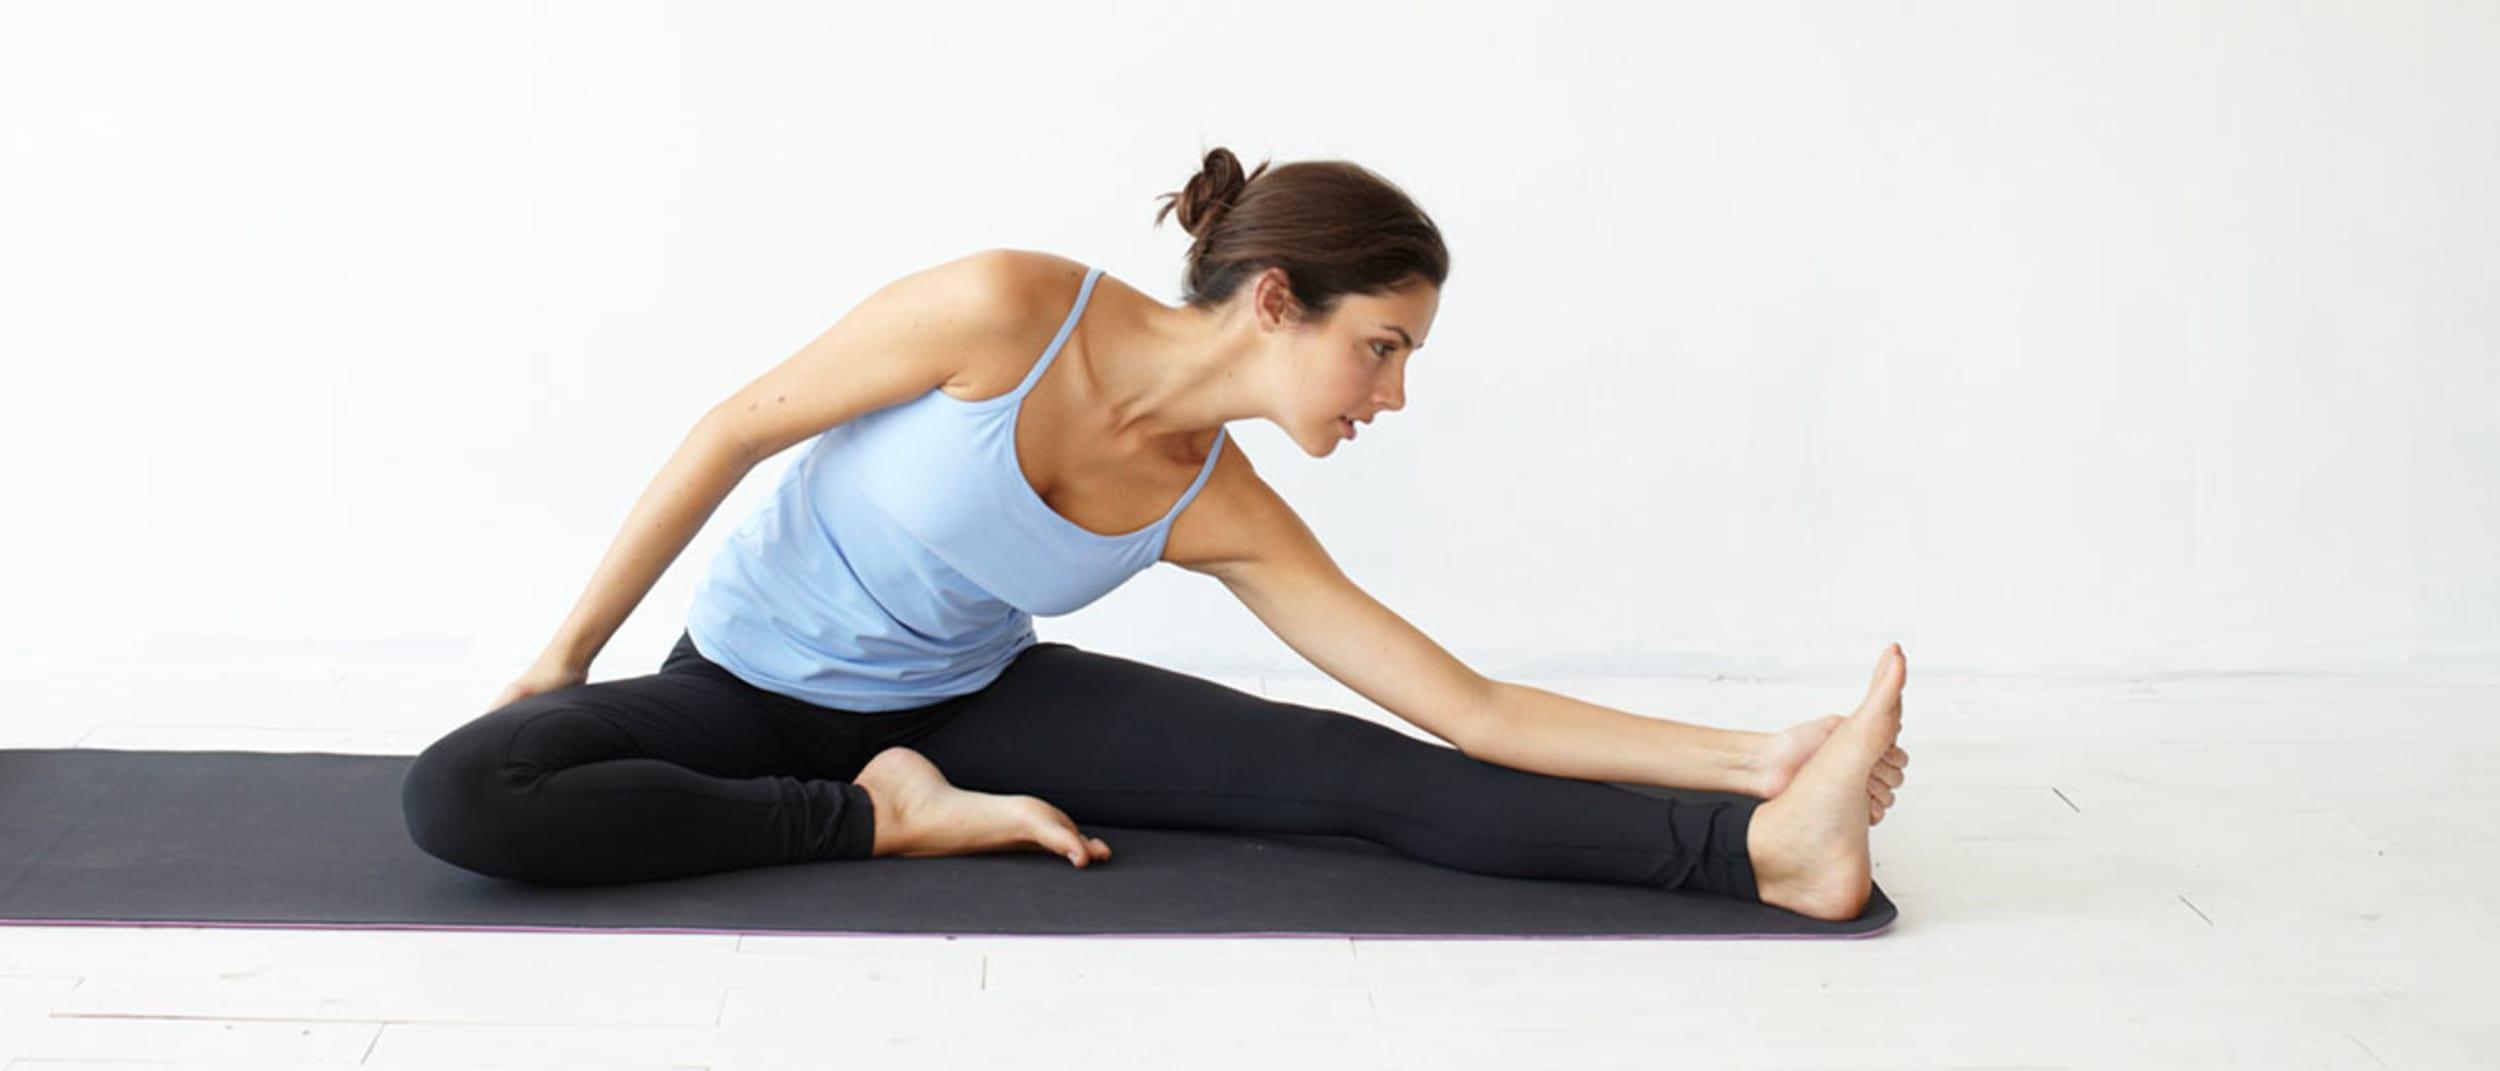 Merino wool for yoga